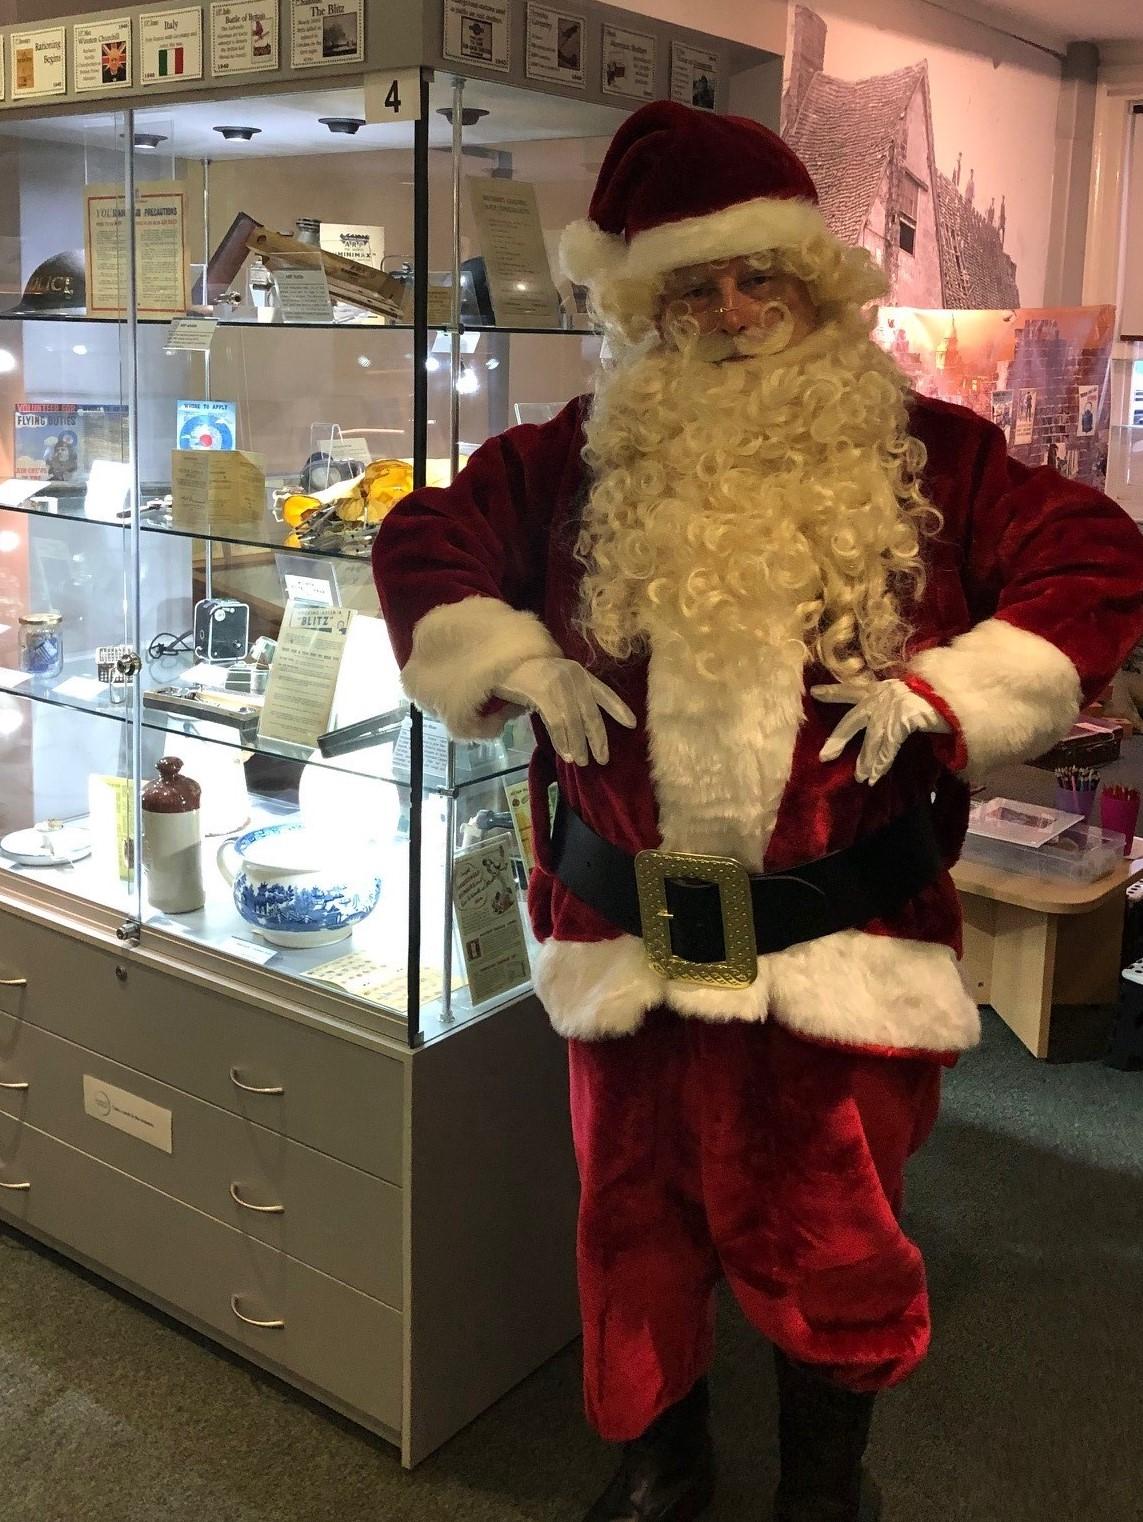 Man in Santa costume.